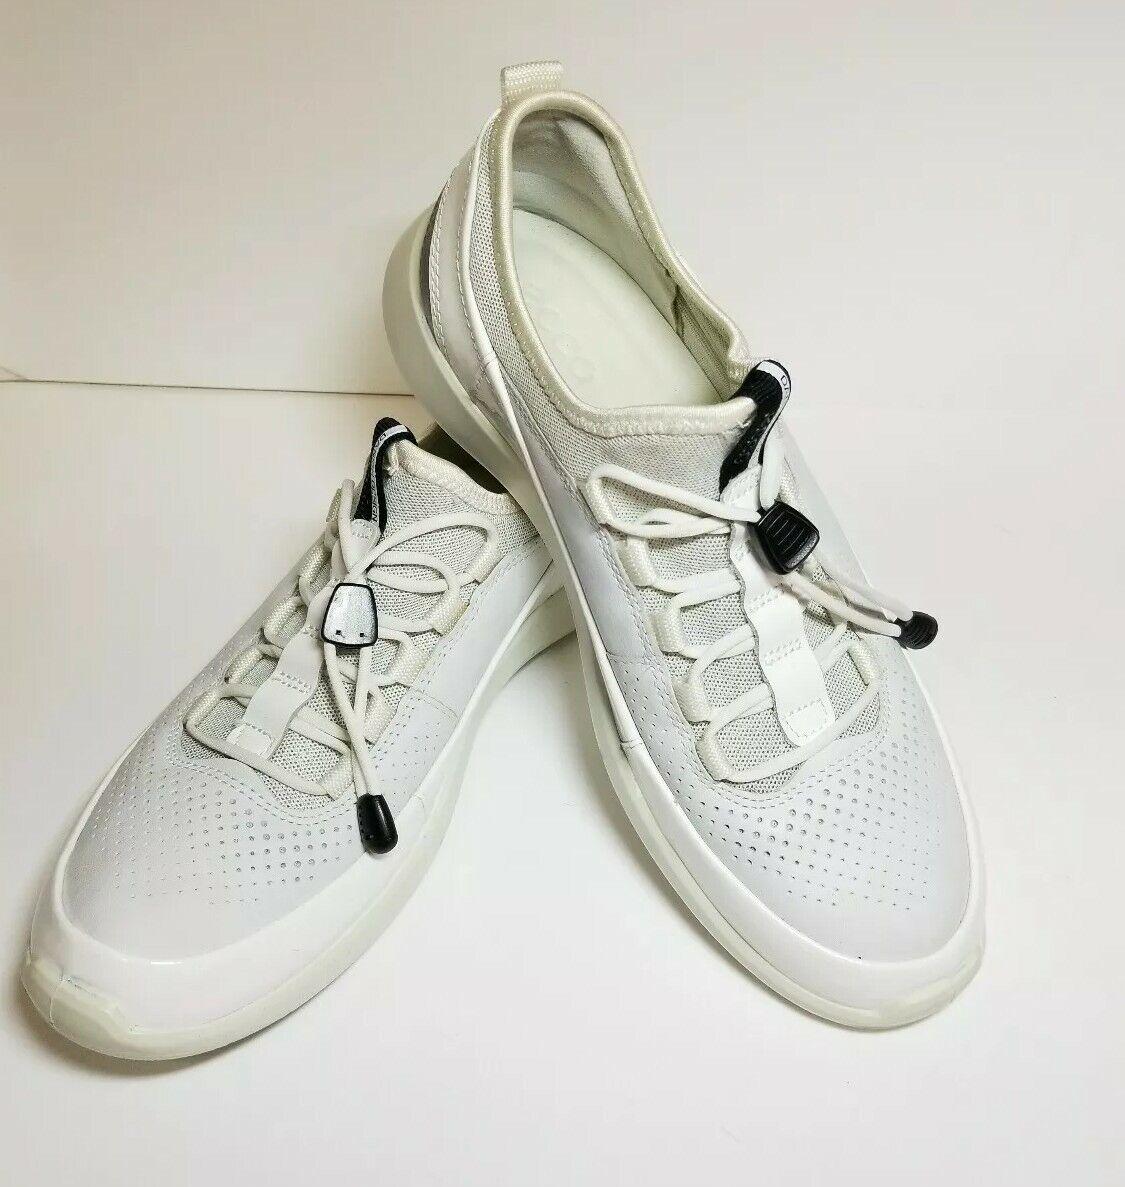 New sz 6 Ecco Soft 5 Toggle White Womens Fashion Sneaker Slip On Size 37M